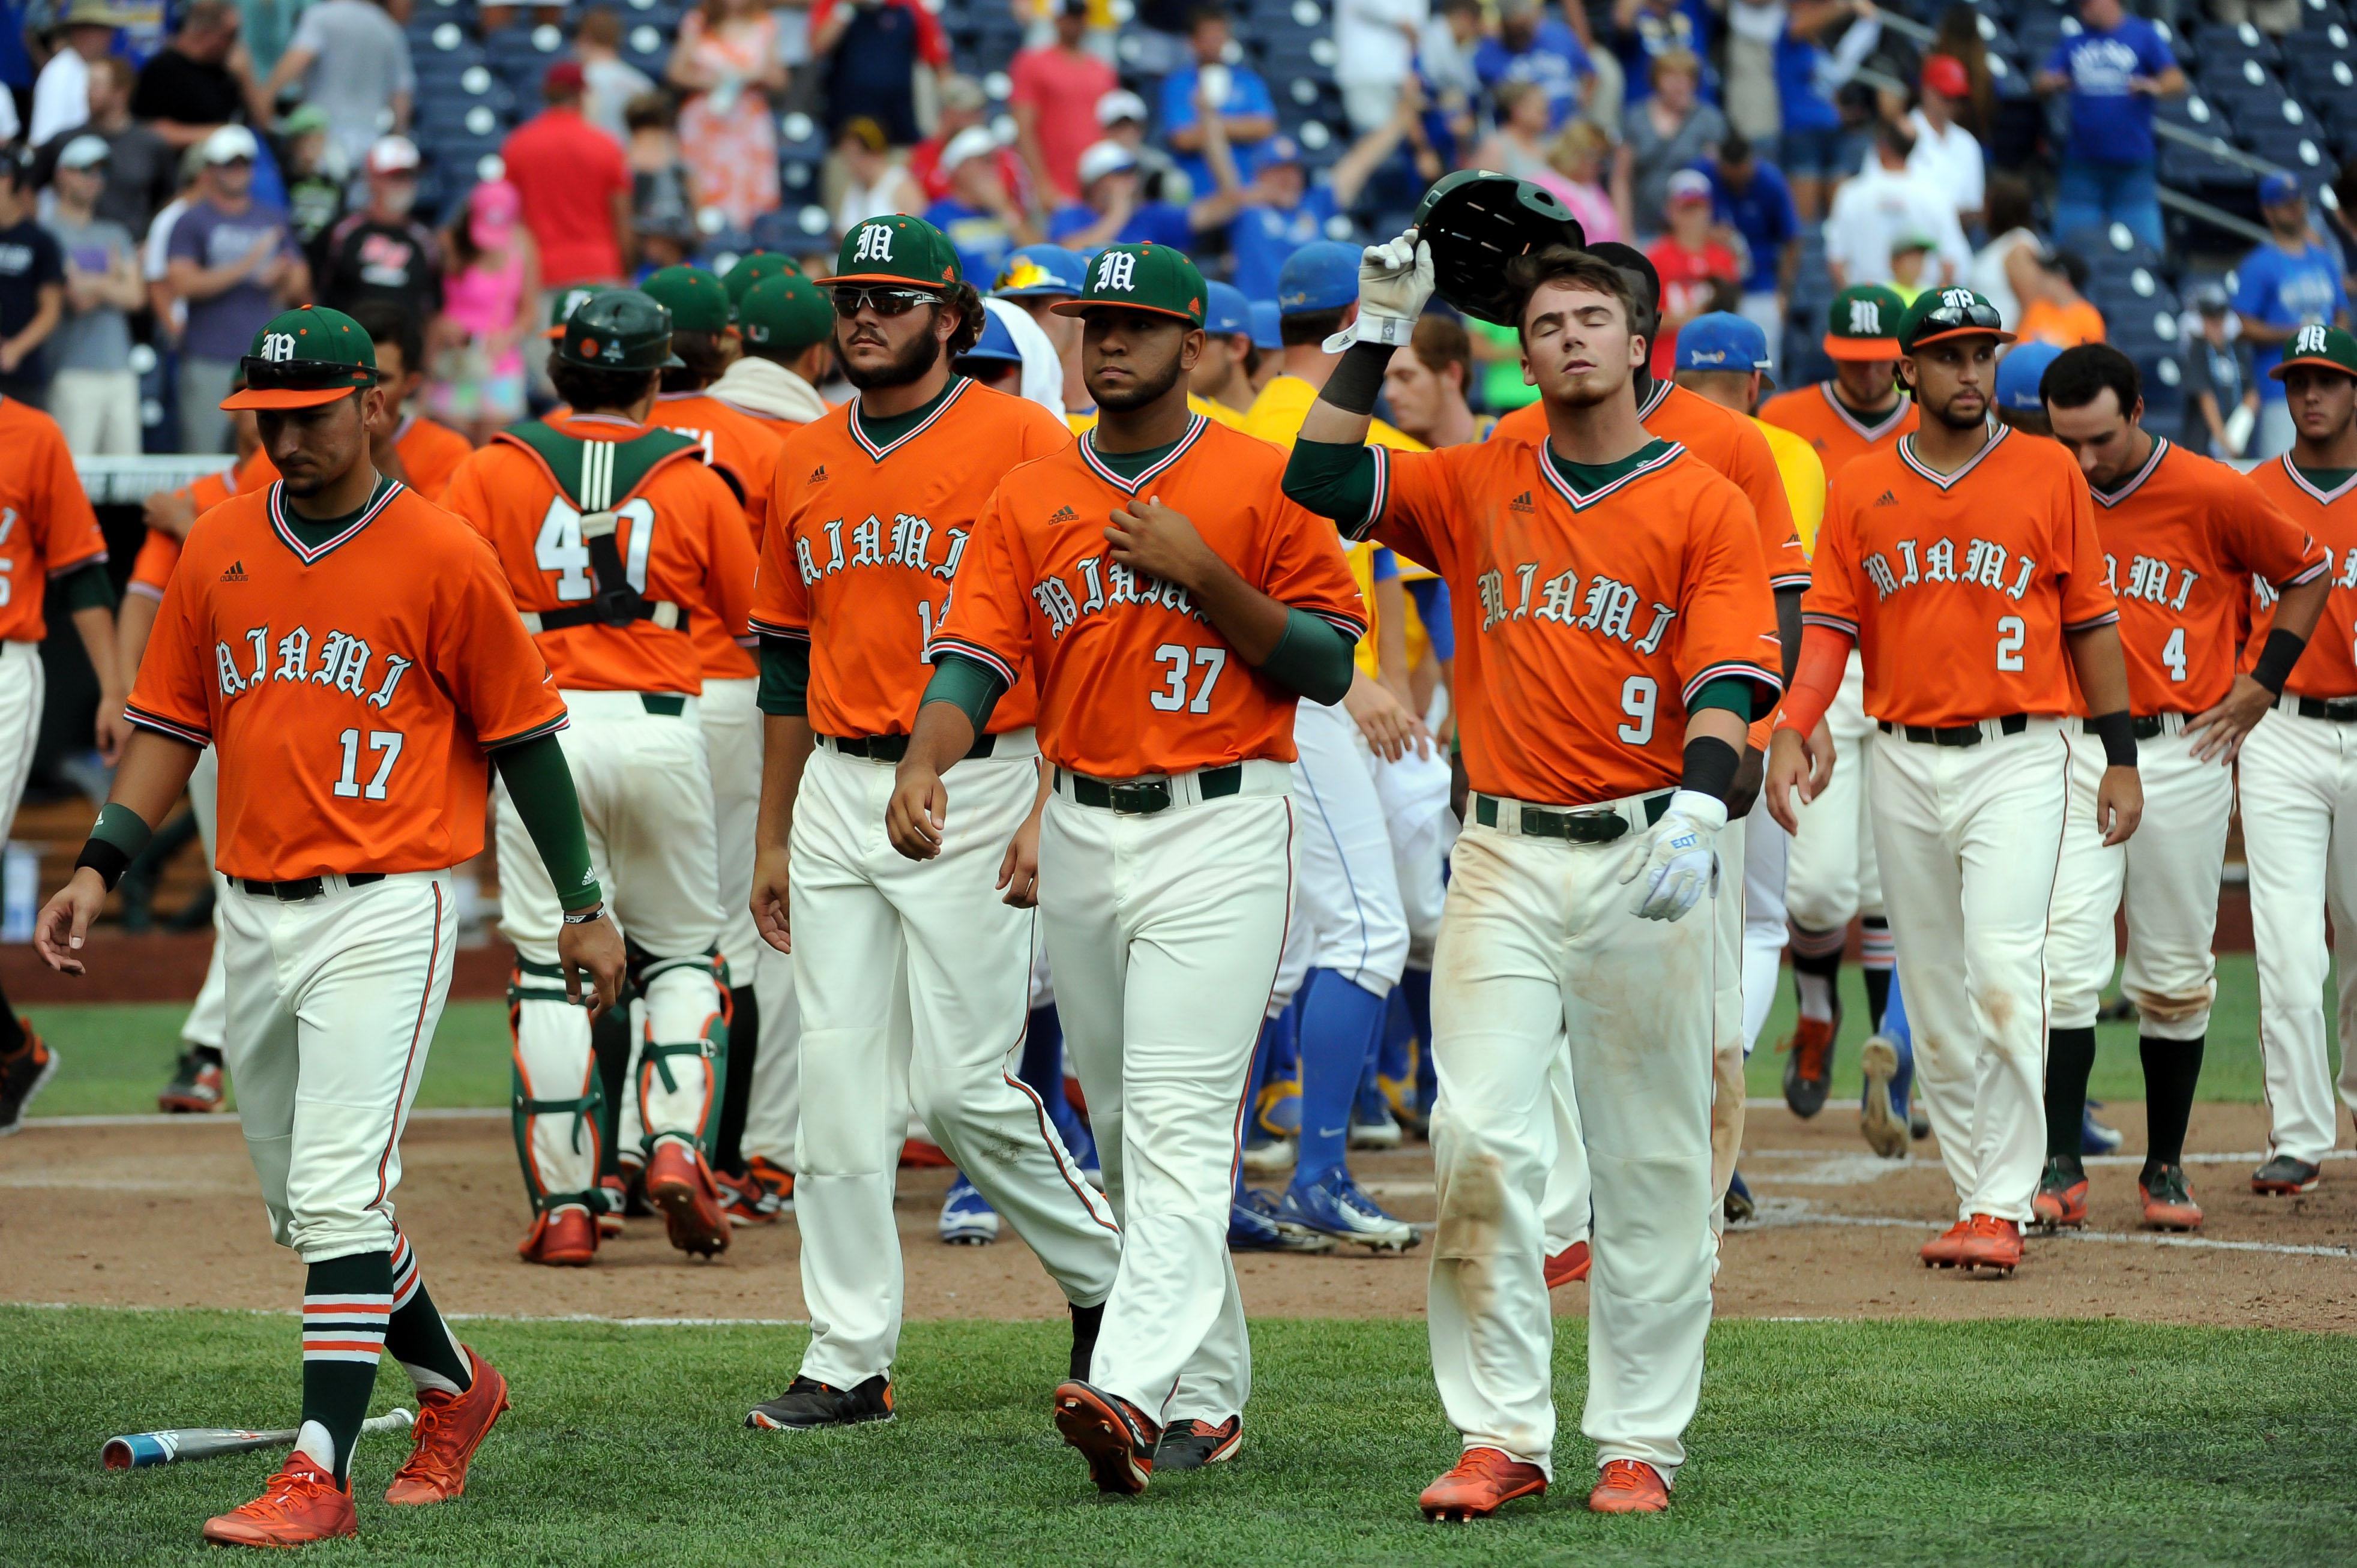 9349985-ncaa-baseball-college-world-series-miami-vs-uc-santa-barbara